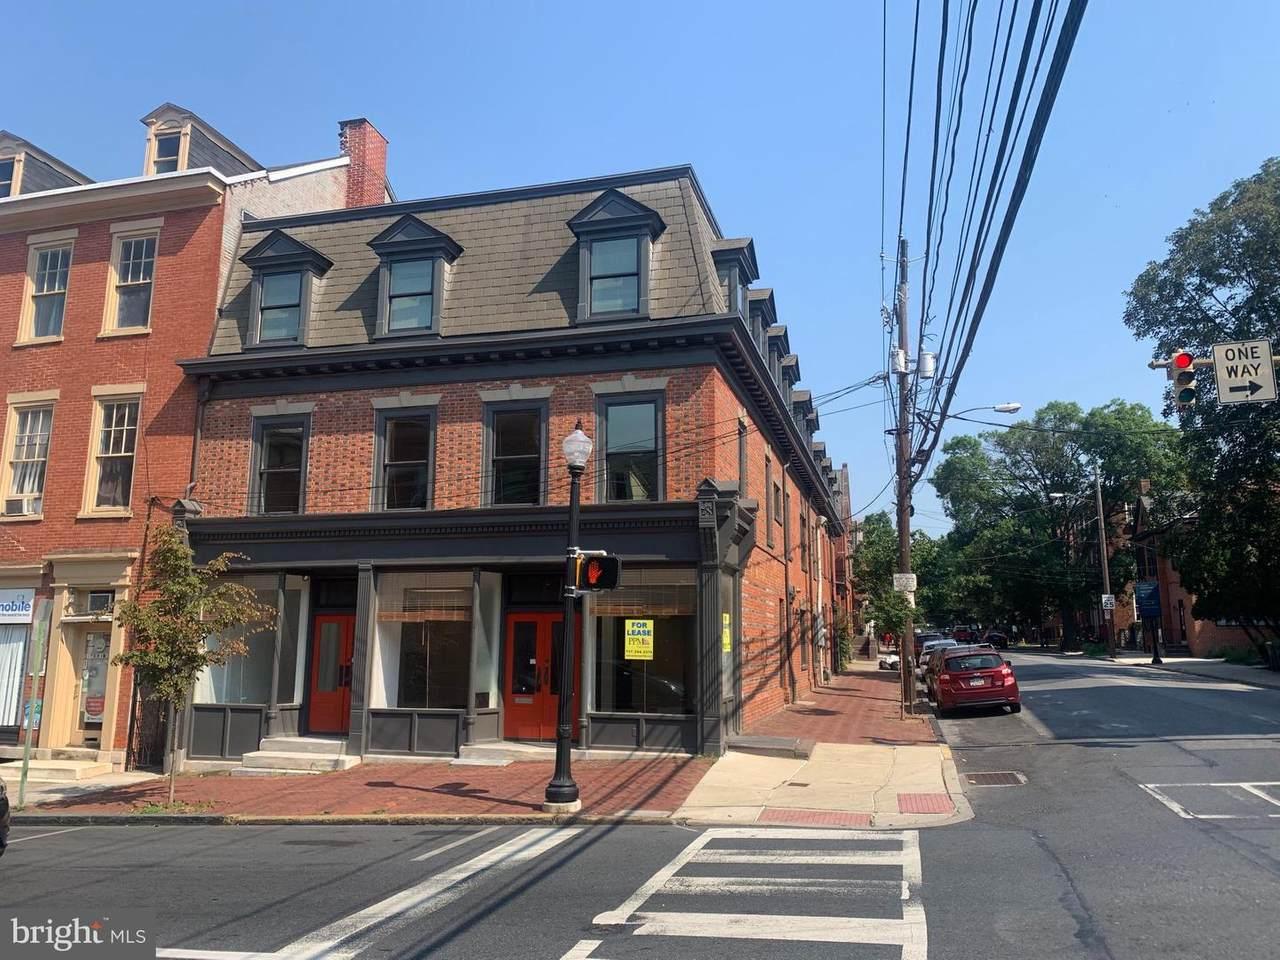 171 King Street - Photo 1